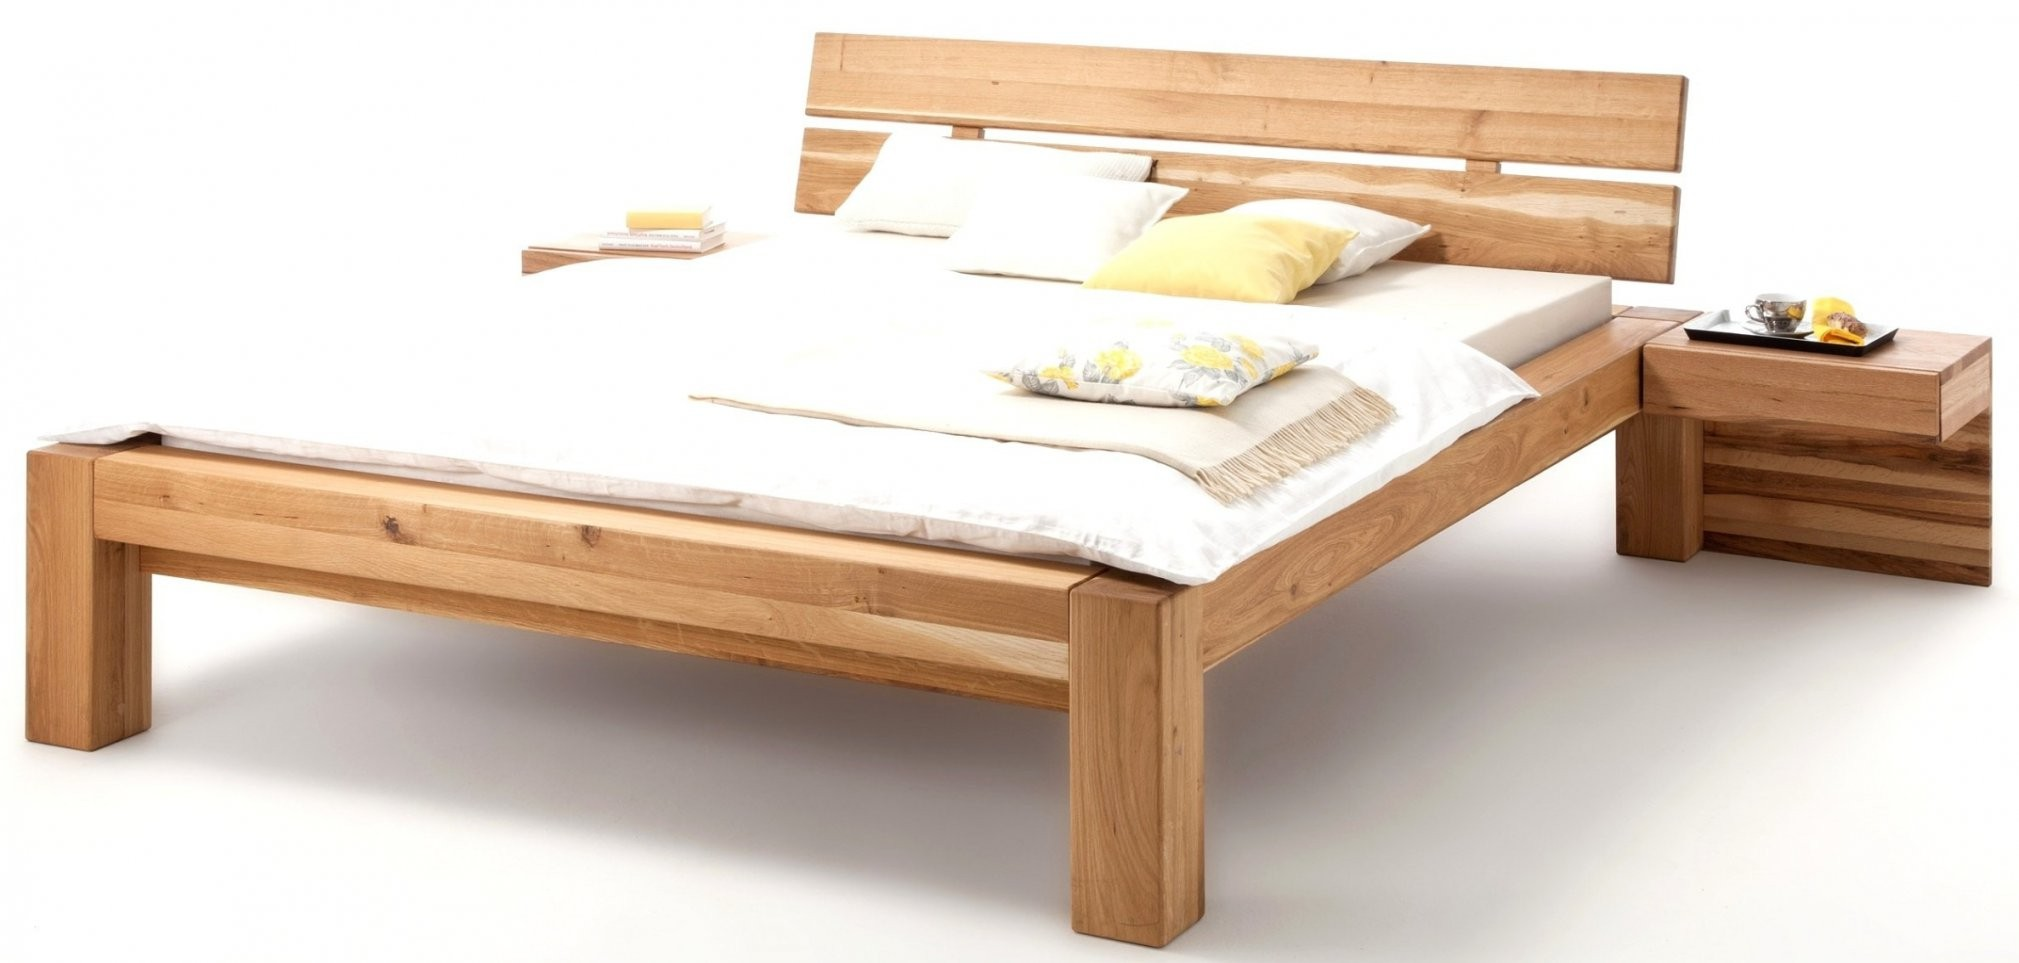 Kleines Doppelbett Neu Frisch Bett 200×200 Holz Massiv Wamustory von Bett Holz 200X200 Photo